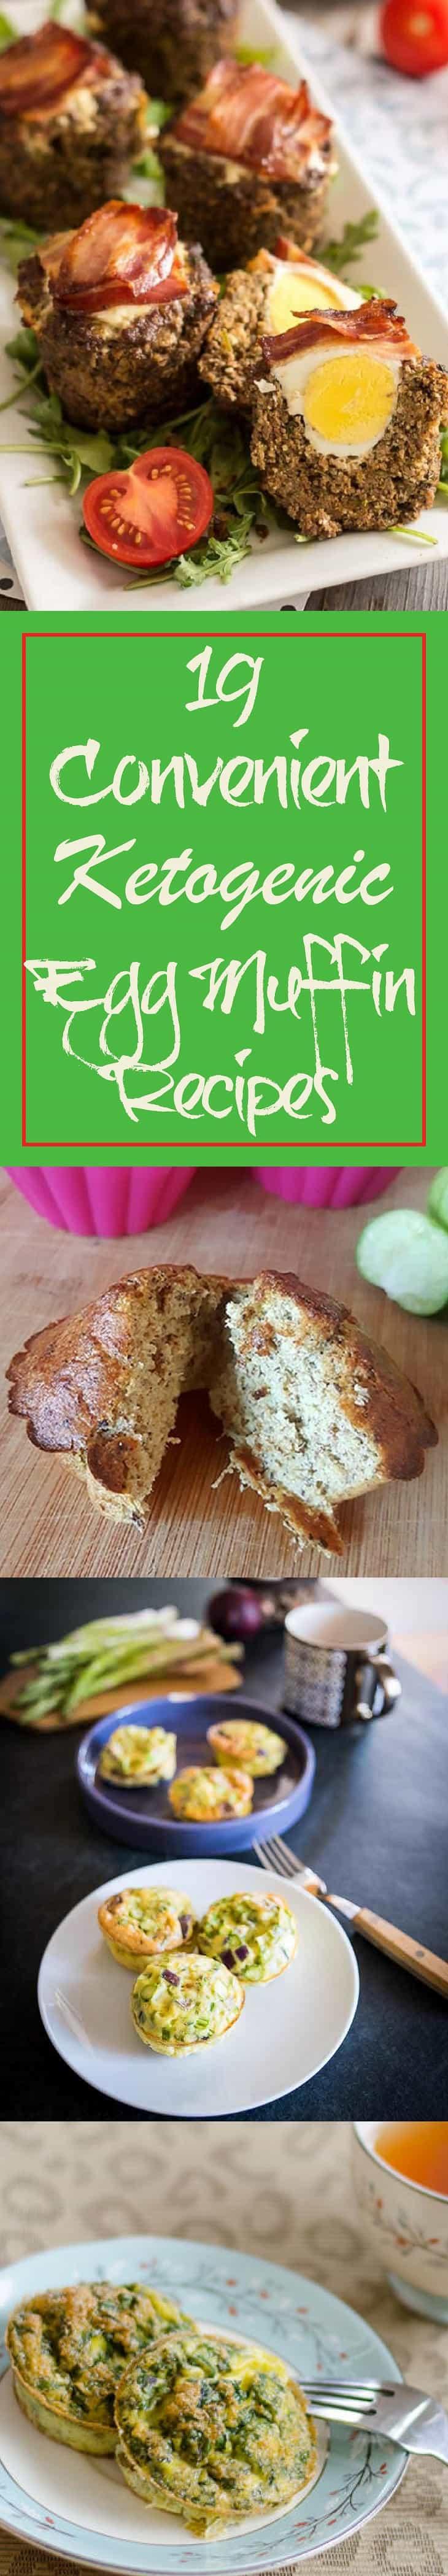 Ketogenic Egg Muffin Recipes #keto - https://ketosummit.com/ketogenic-egg-muffin-recipes/